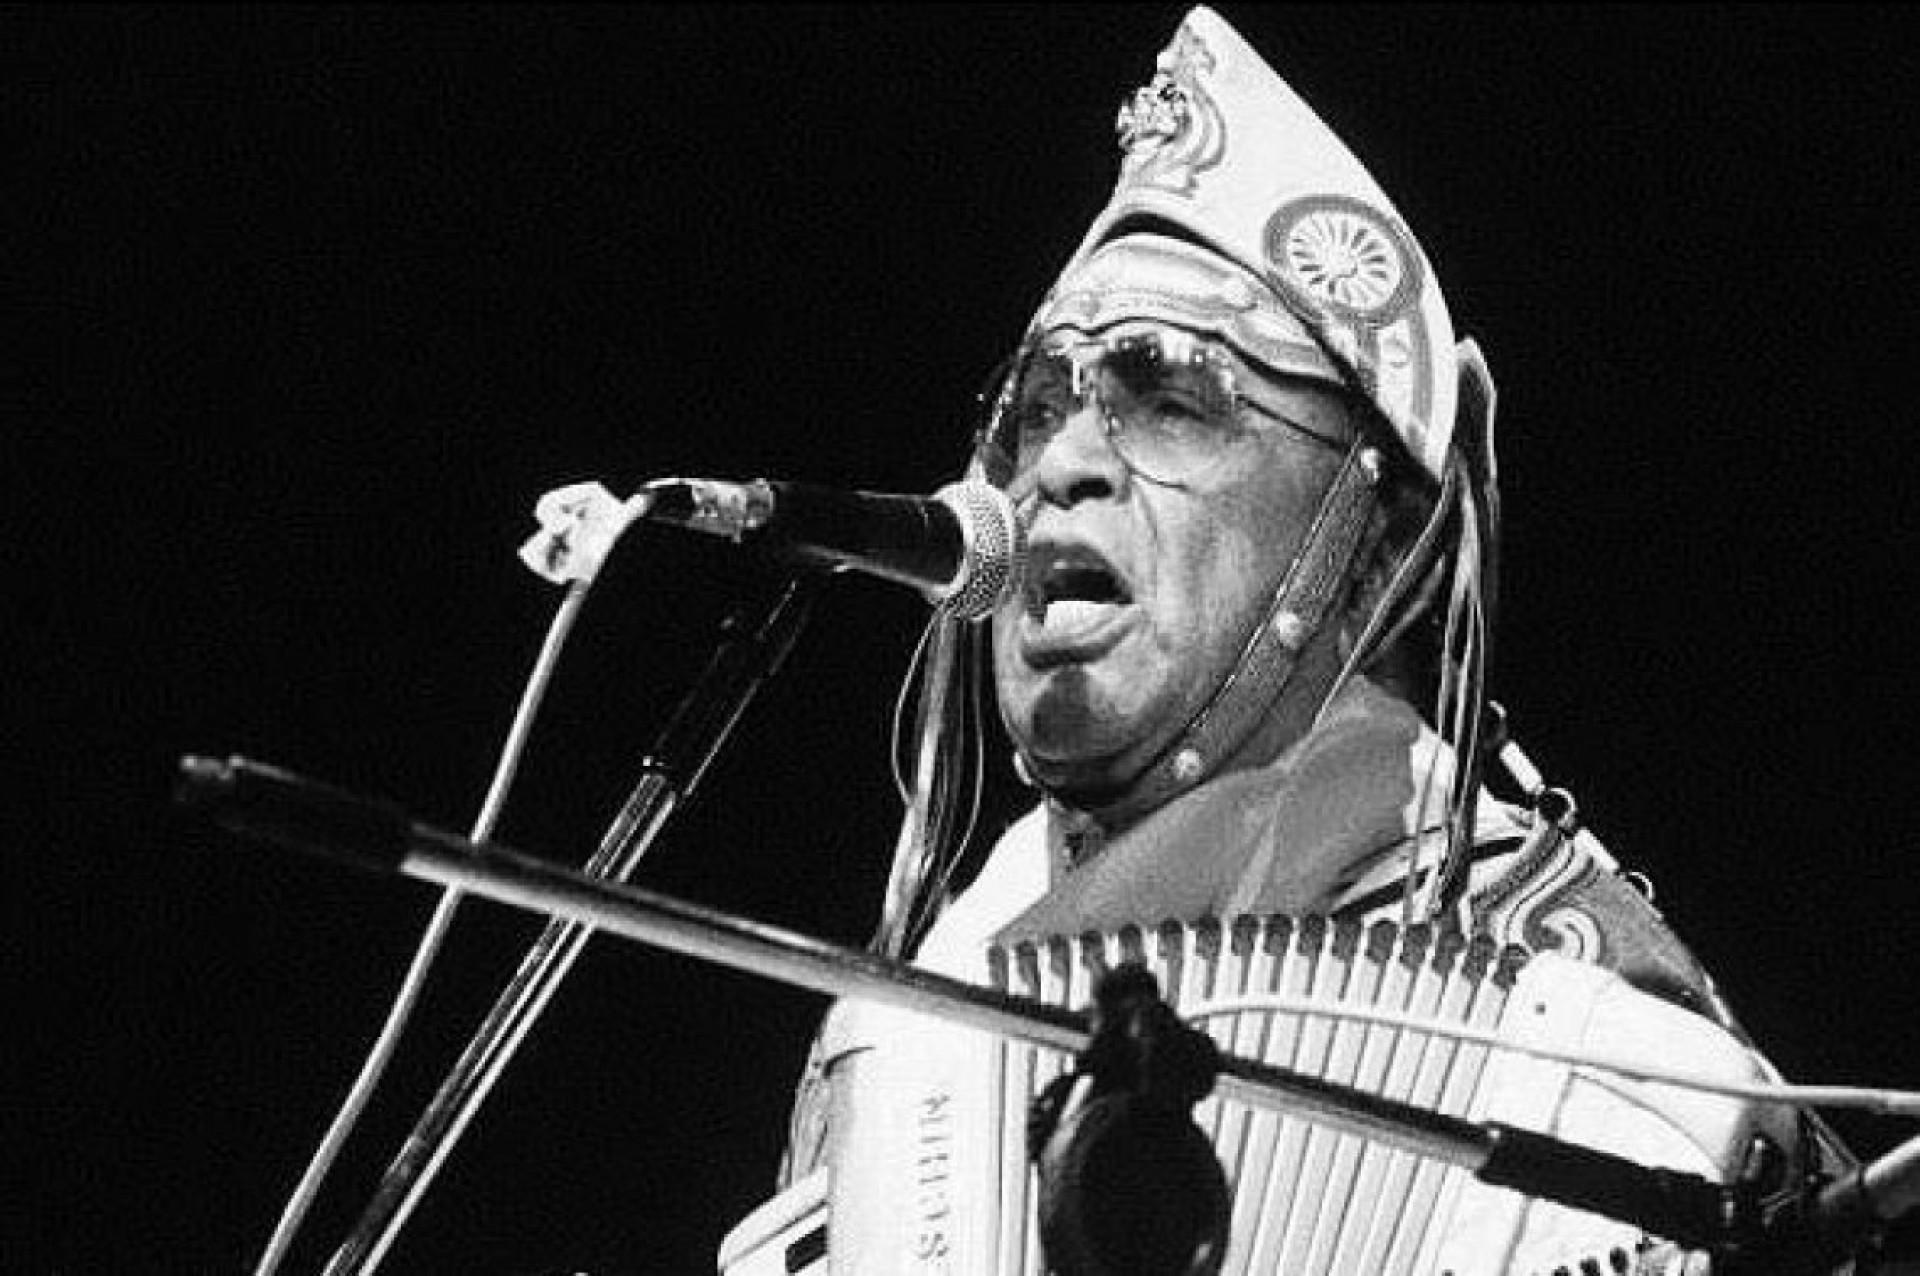 O cantor e compositor pernambucano Luiz Gonzaga faleceu há 30 anos